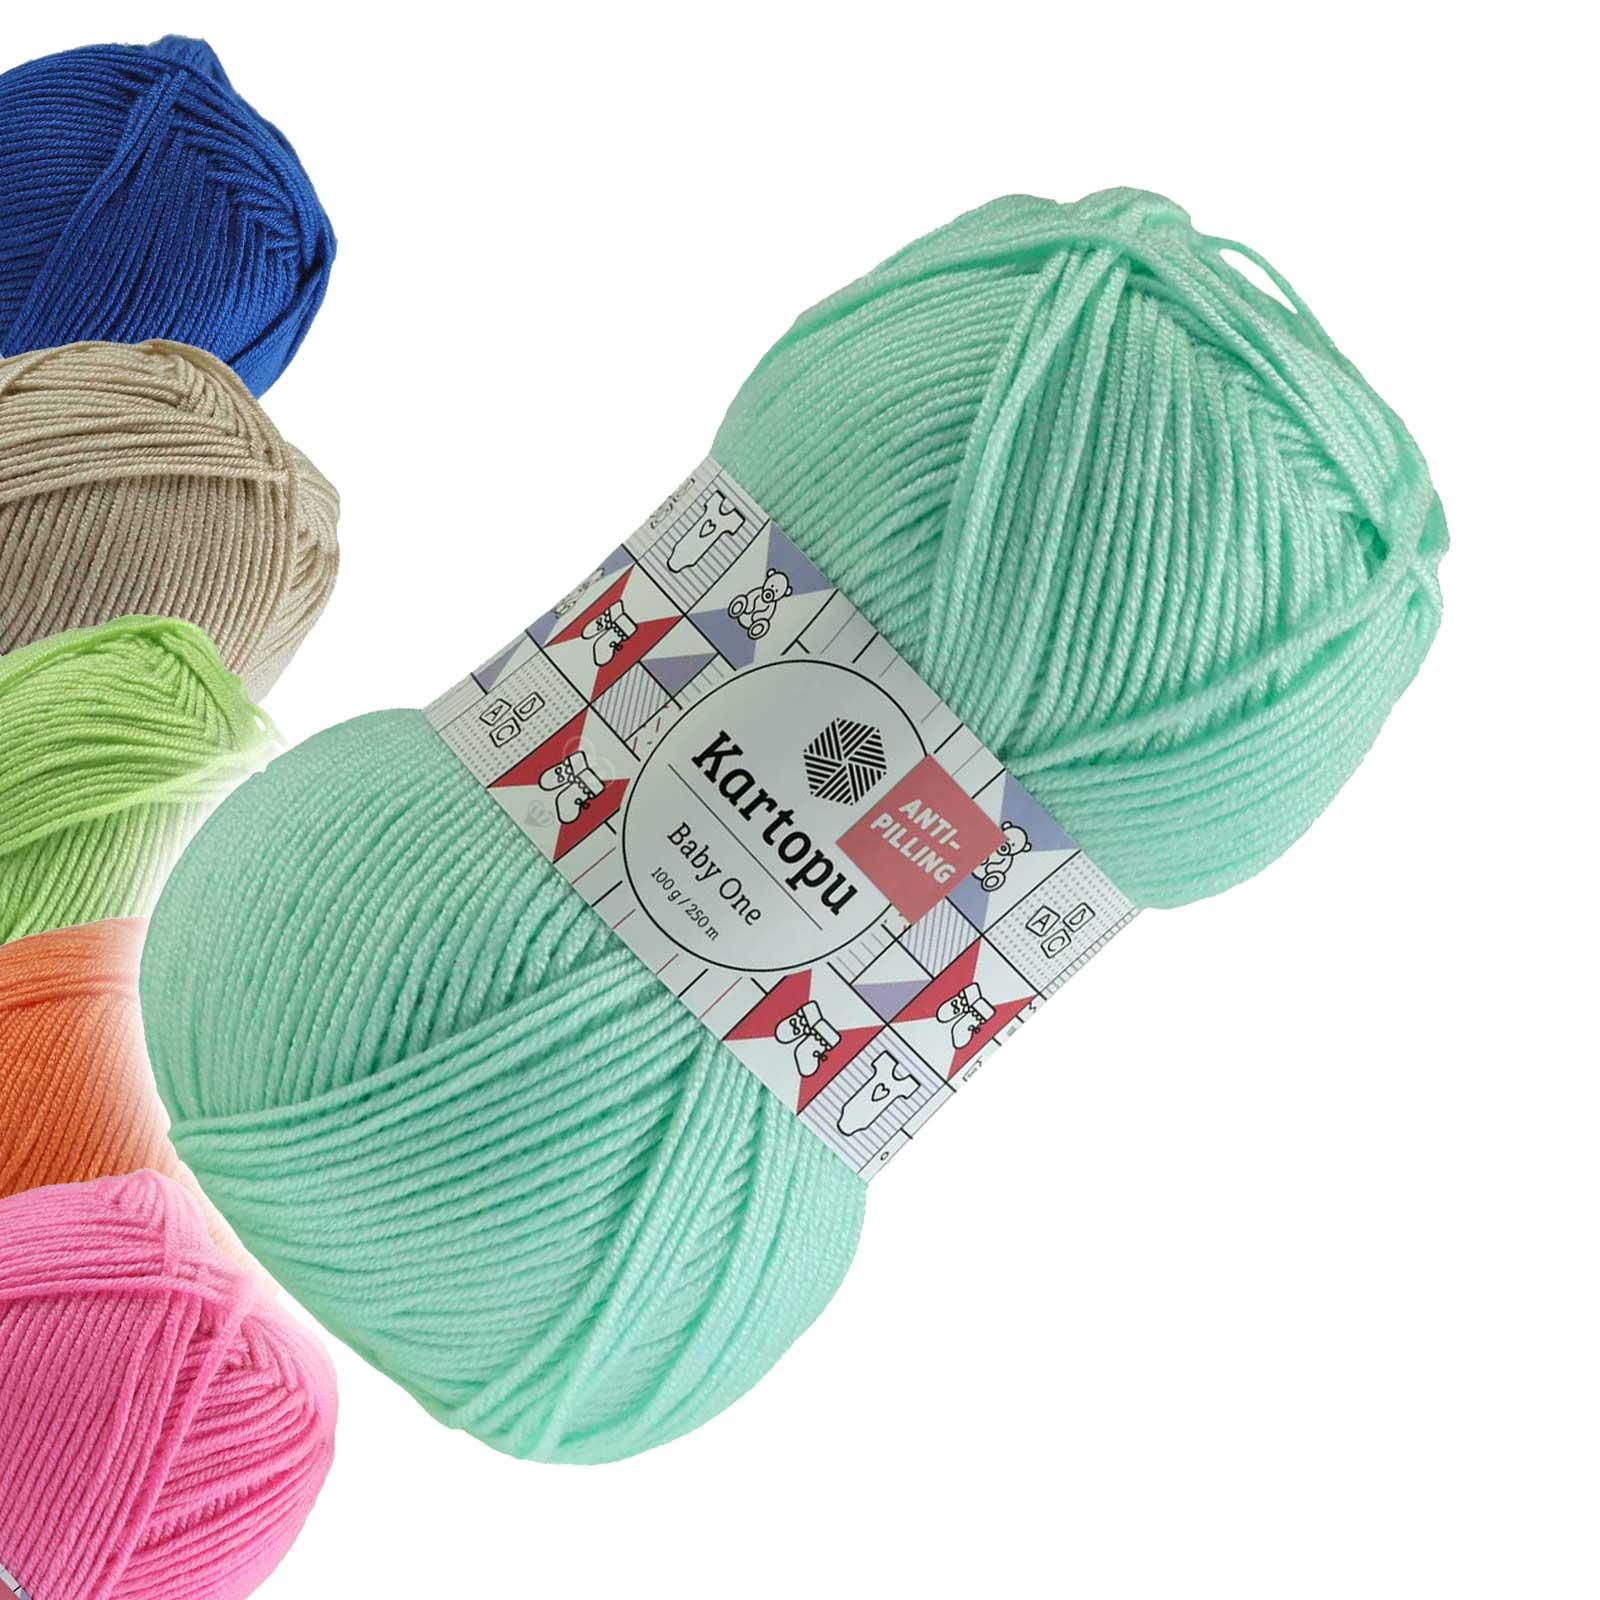 100g Strickgarn Kartopu BABY ONE Antipilling Babywolle Babystrickgarn, Farbwahl – Bild 4